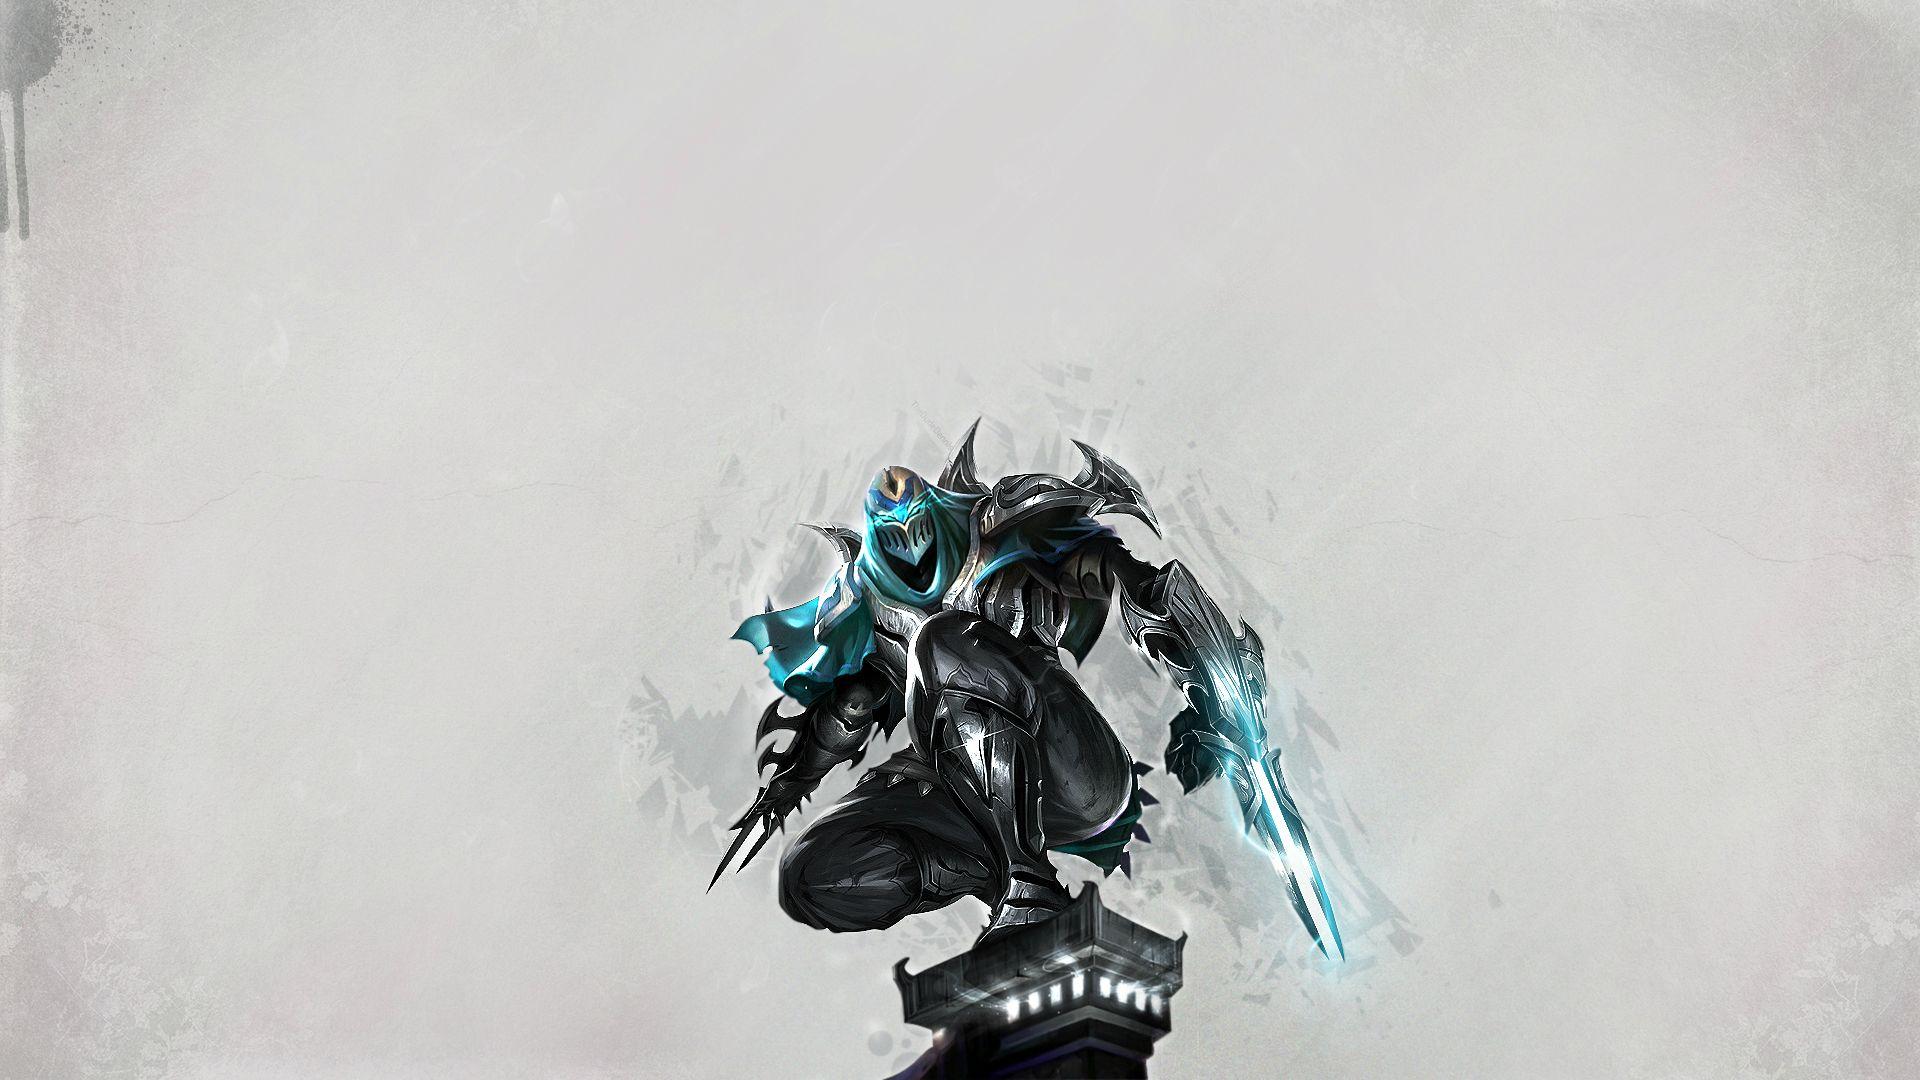 Zed wallpaper by Imprezious - League of Legends Wallpapers